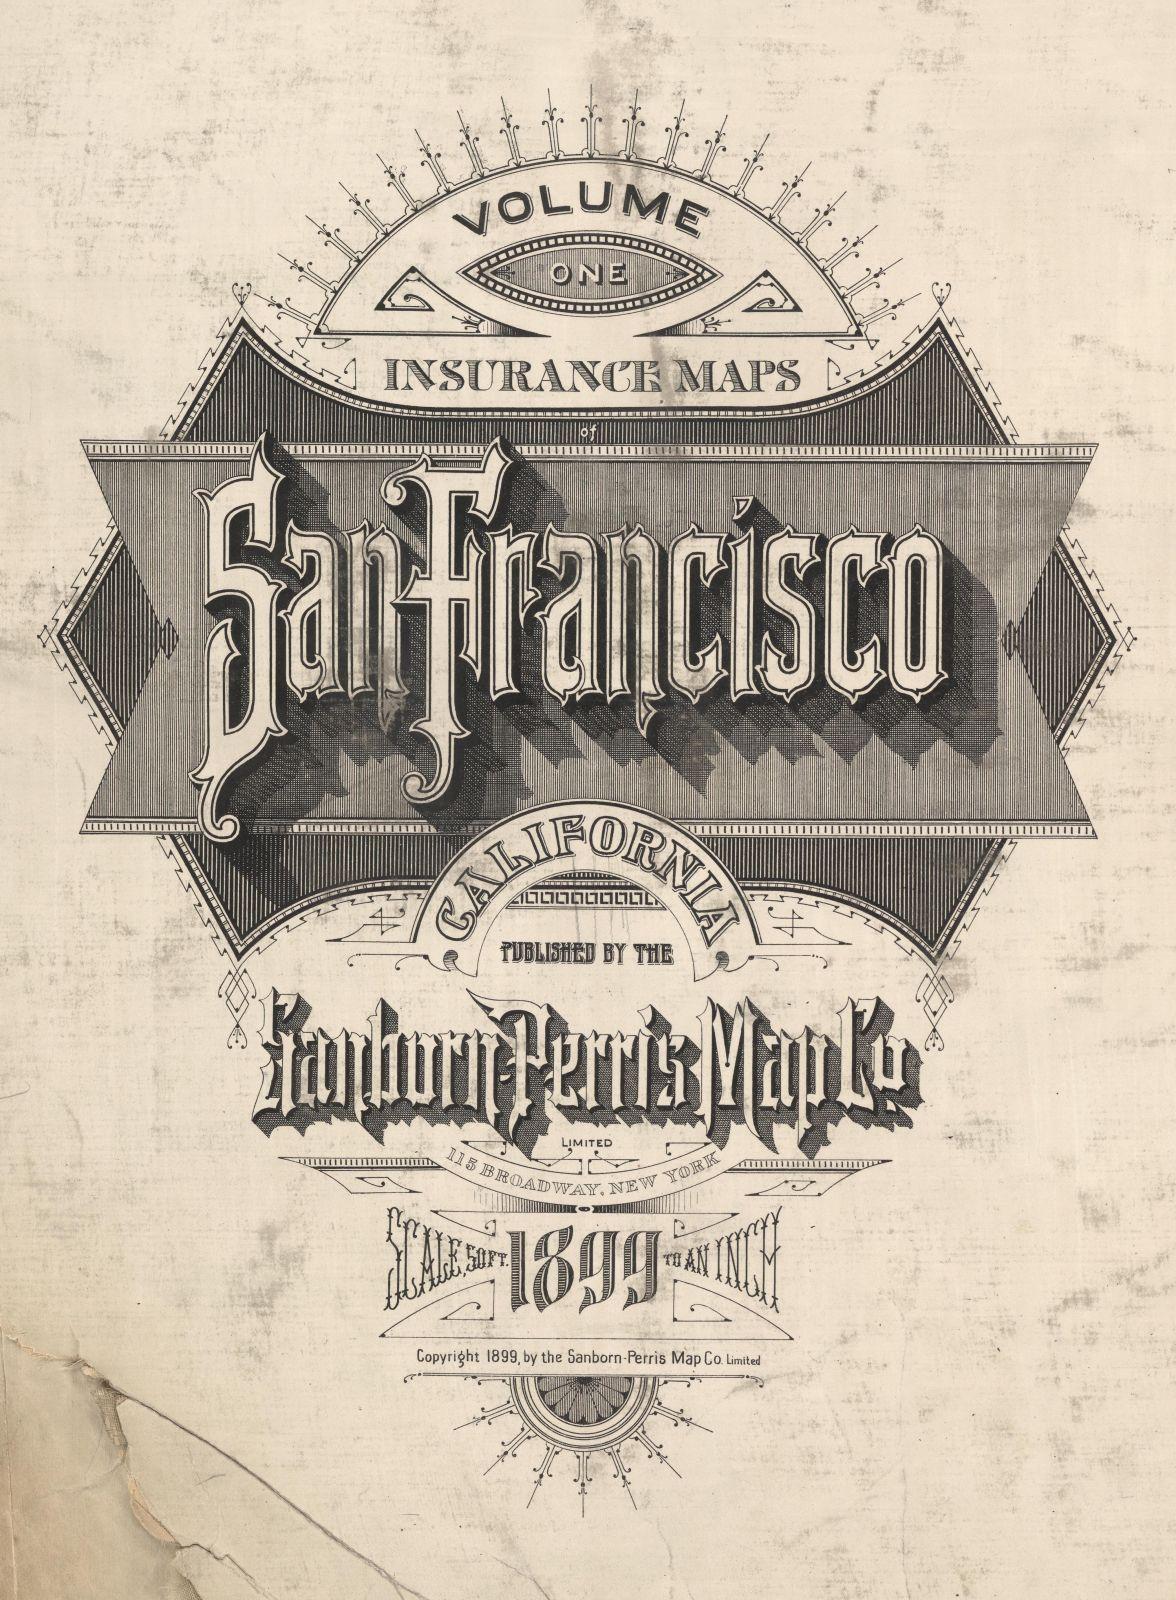 1899 Sanborn San Francisco Fire Insurance Maps - Title Page